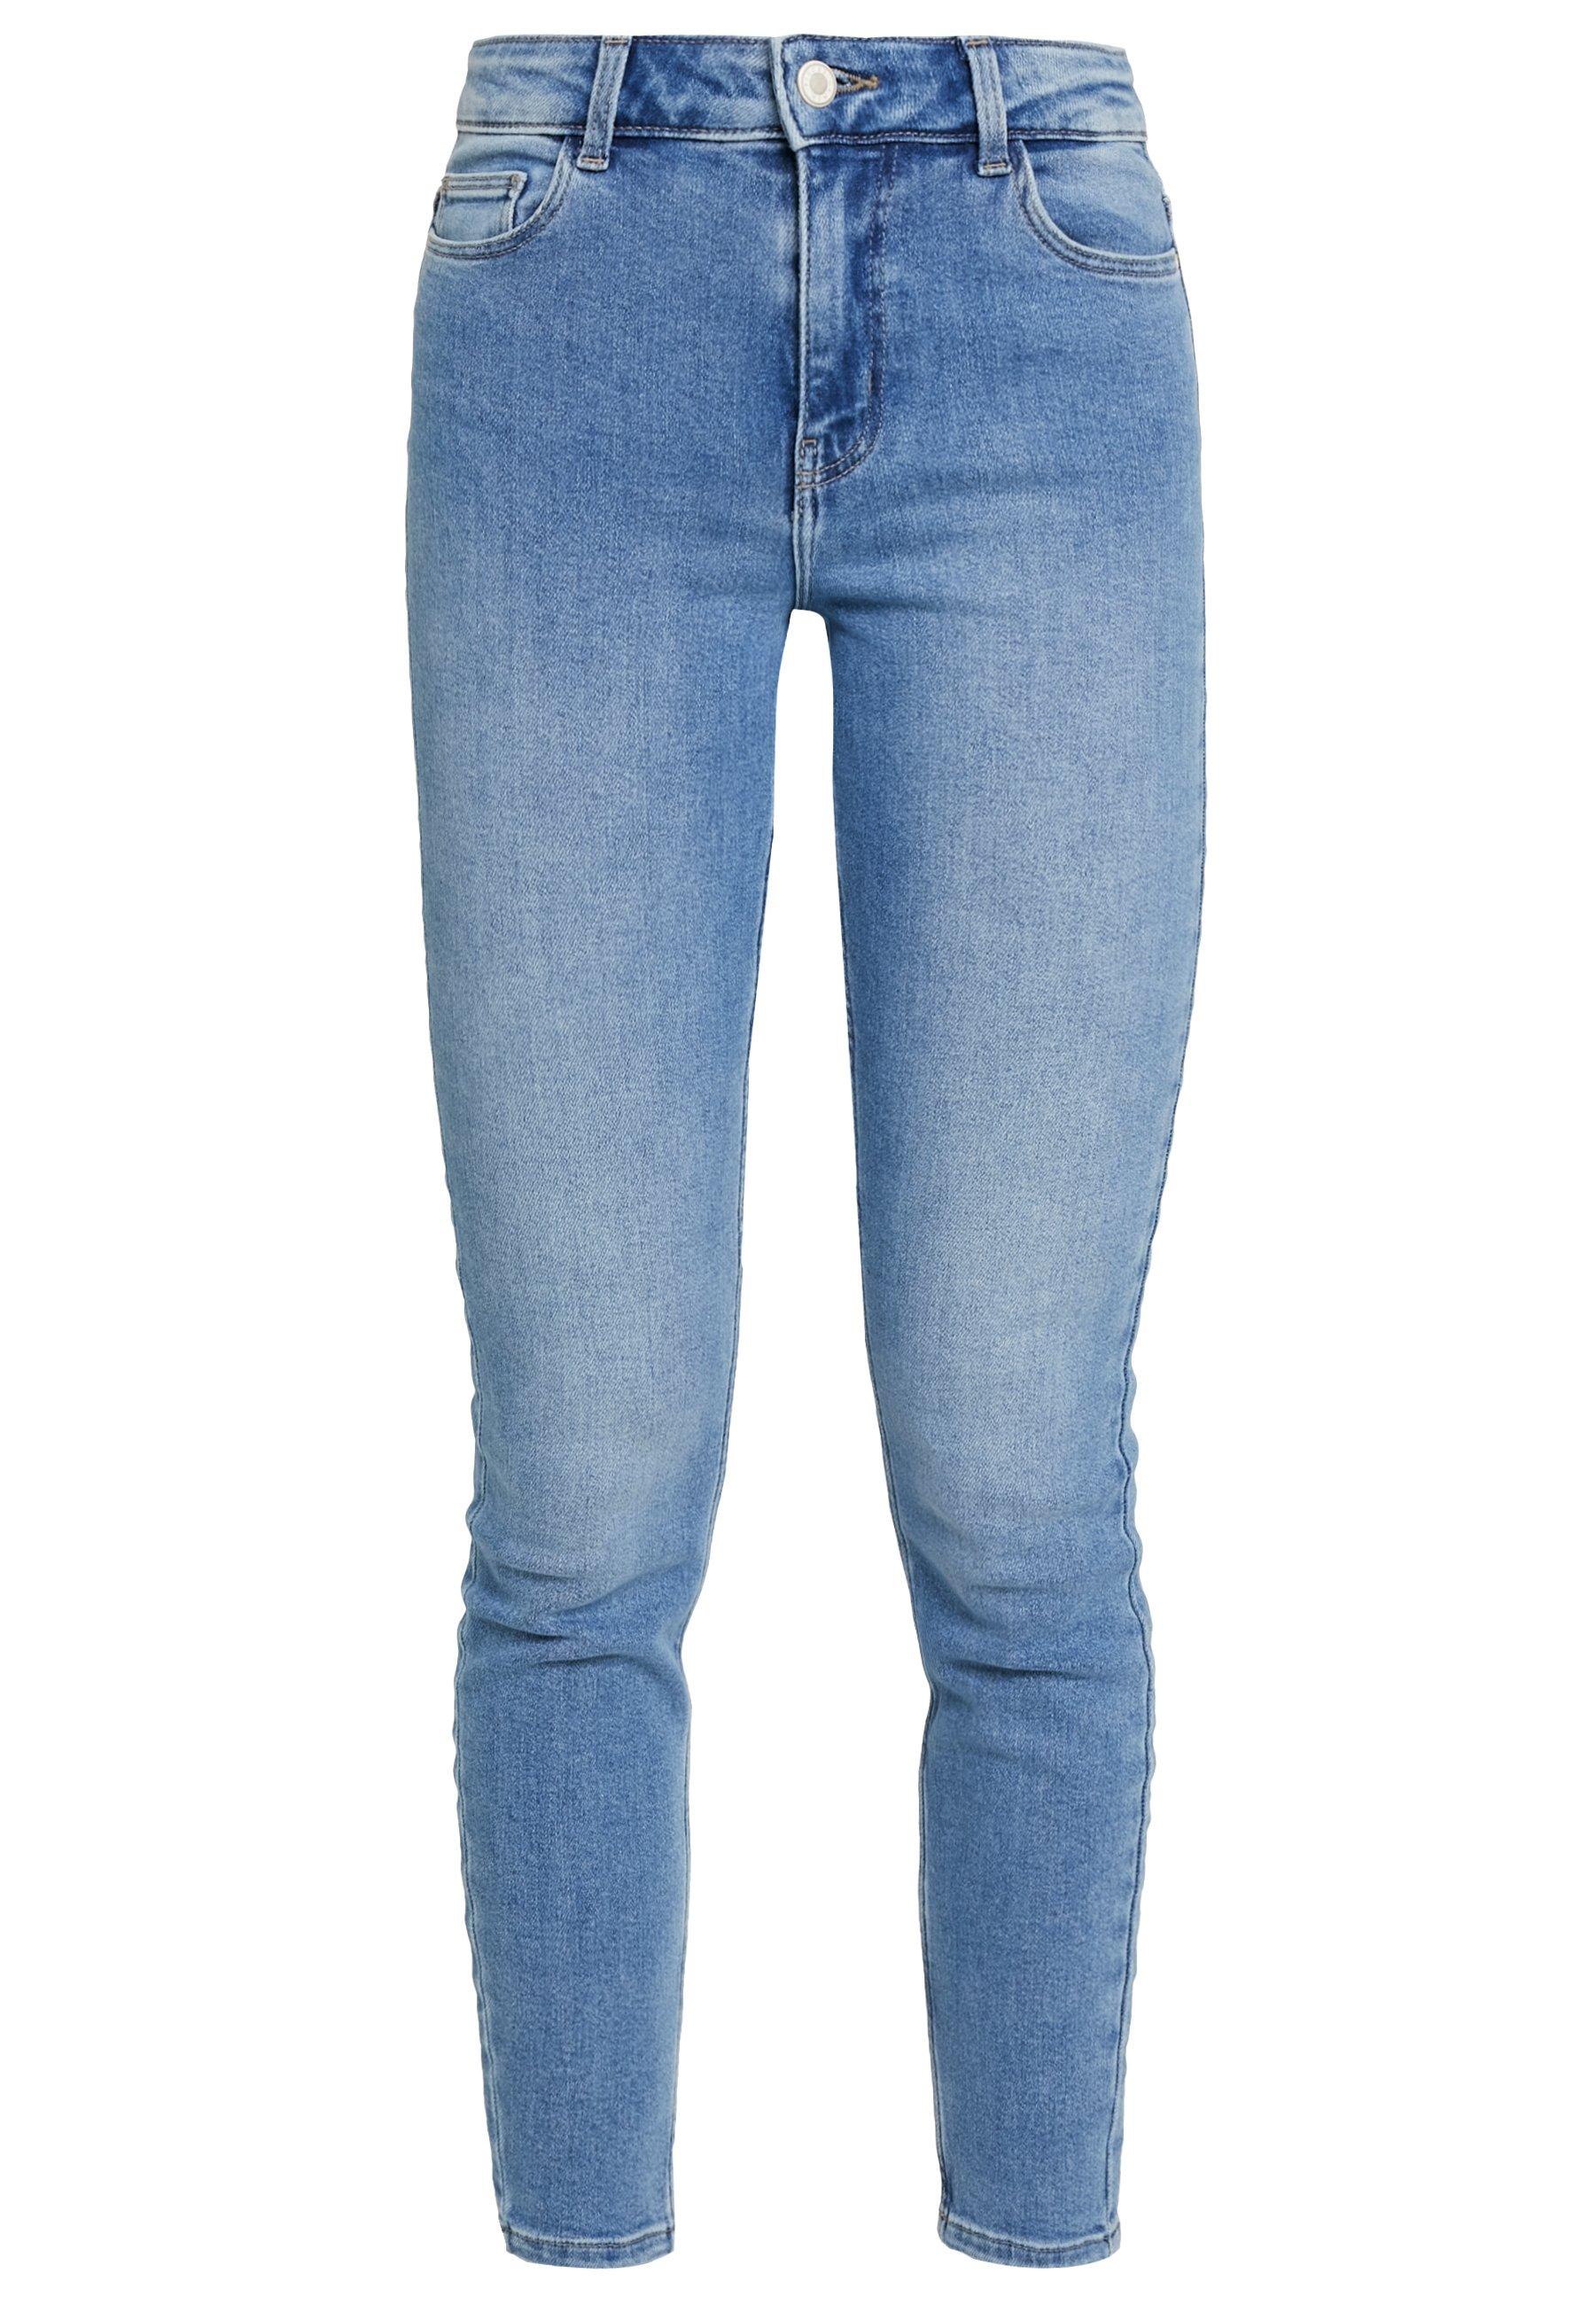 Pieces Pckamelia - Jeans Skinny Light Blue Denim